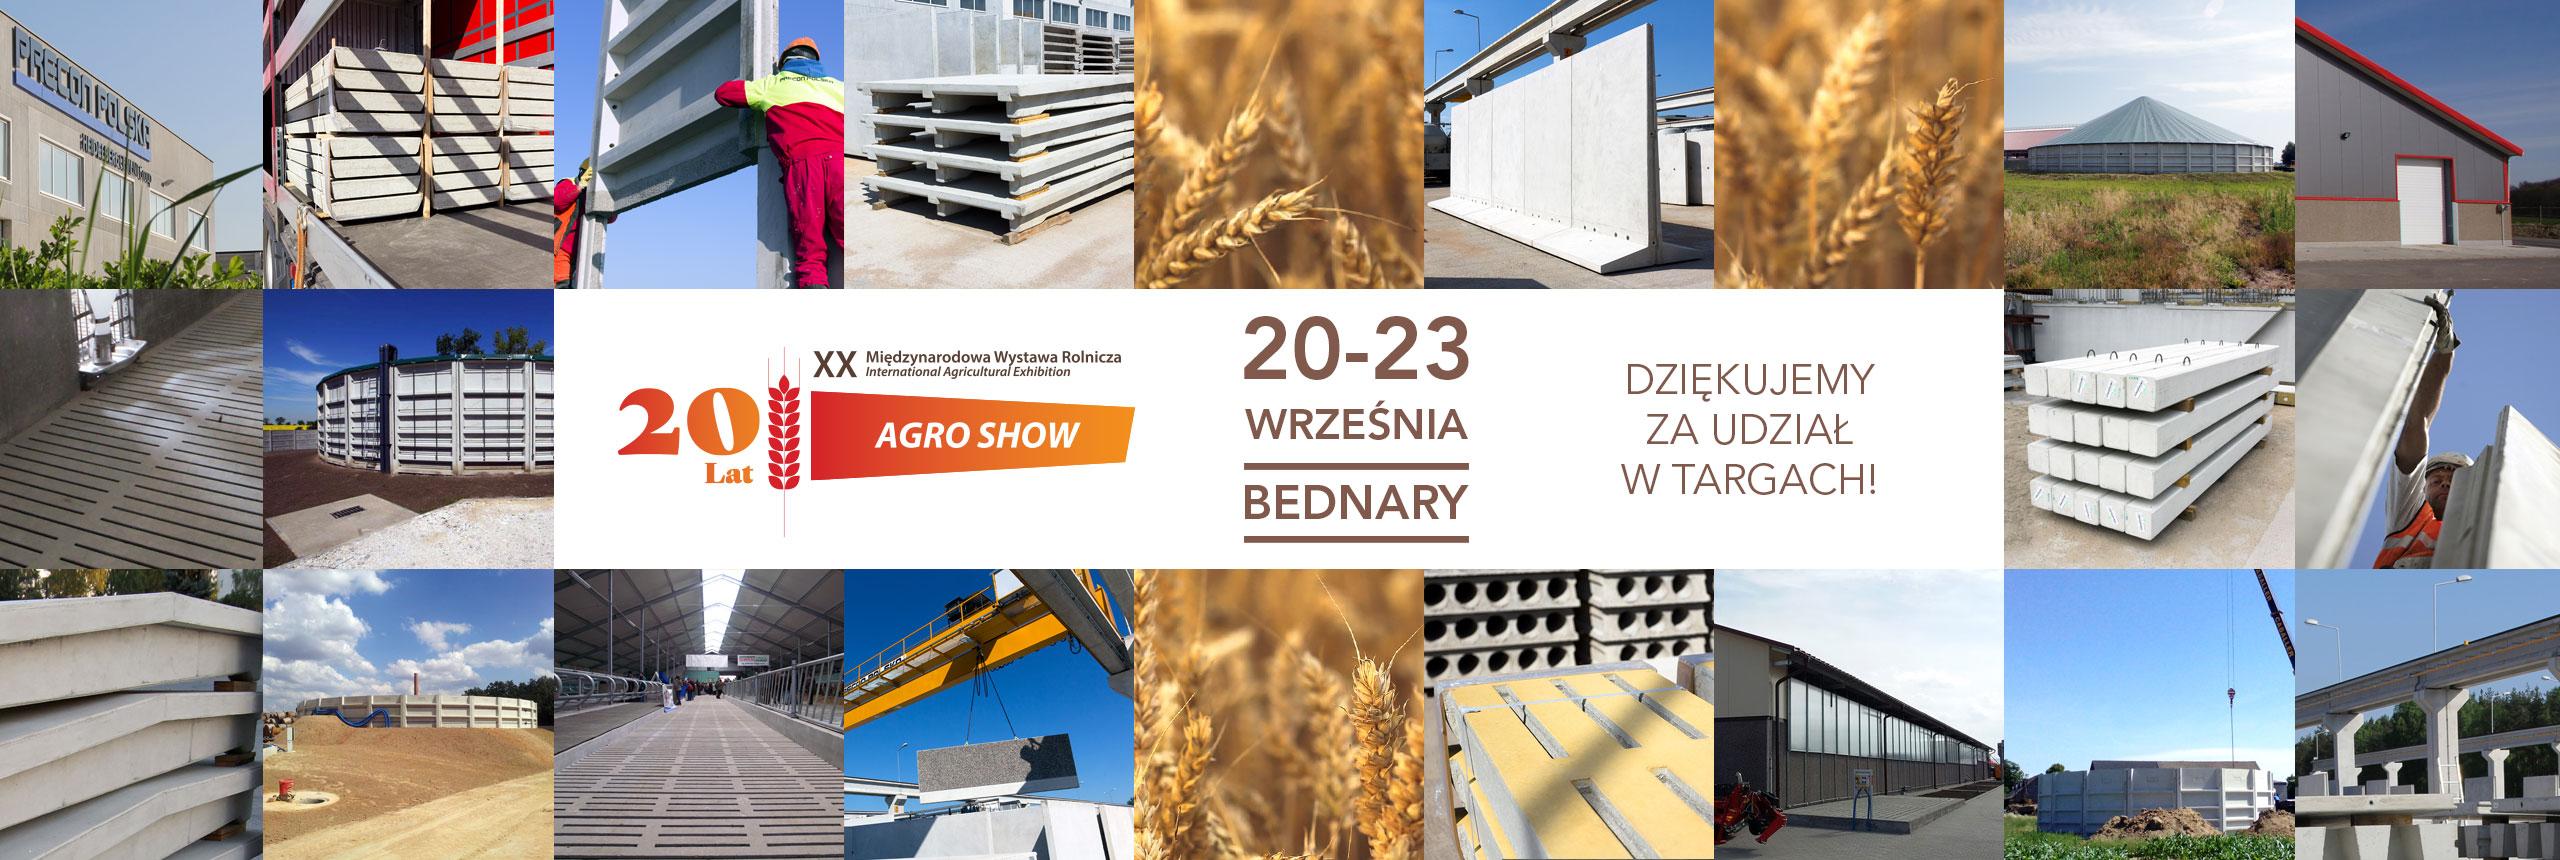 Precon Polska na Agro Show 2018 - Sektor E Nr 149